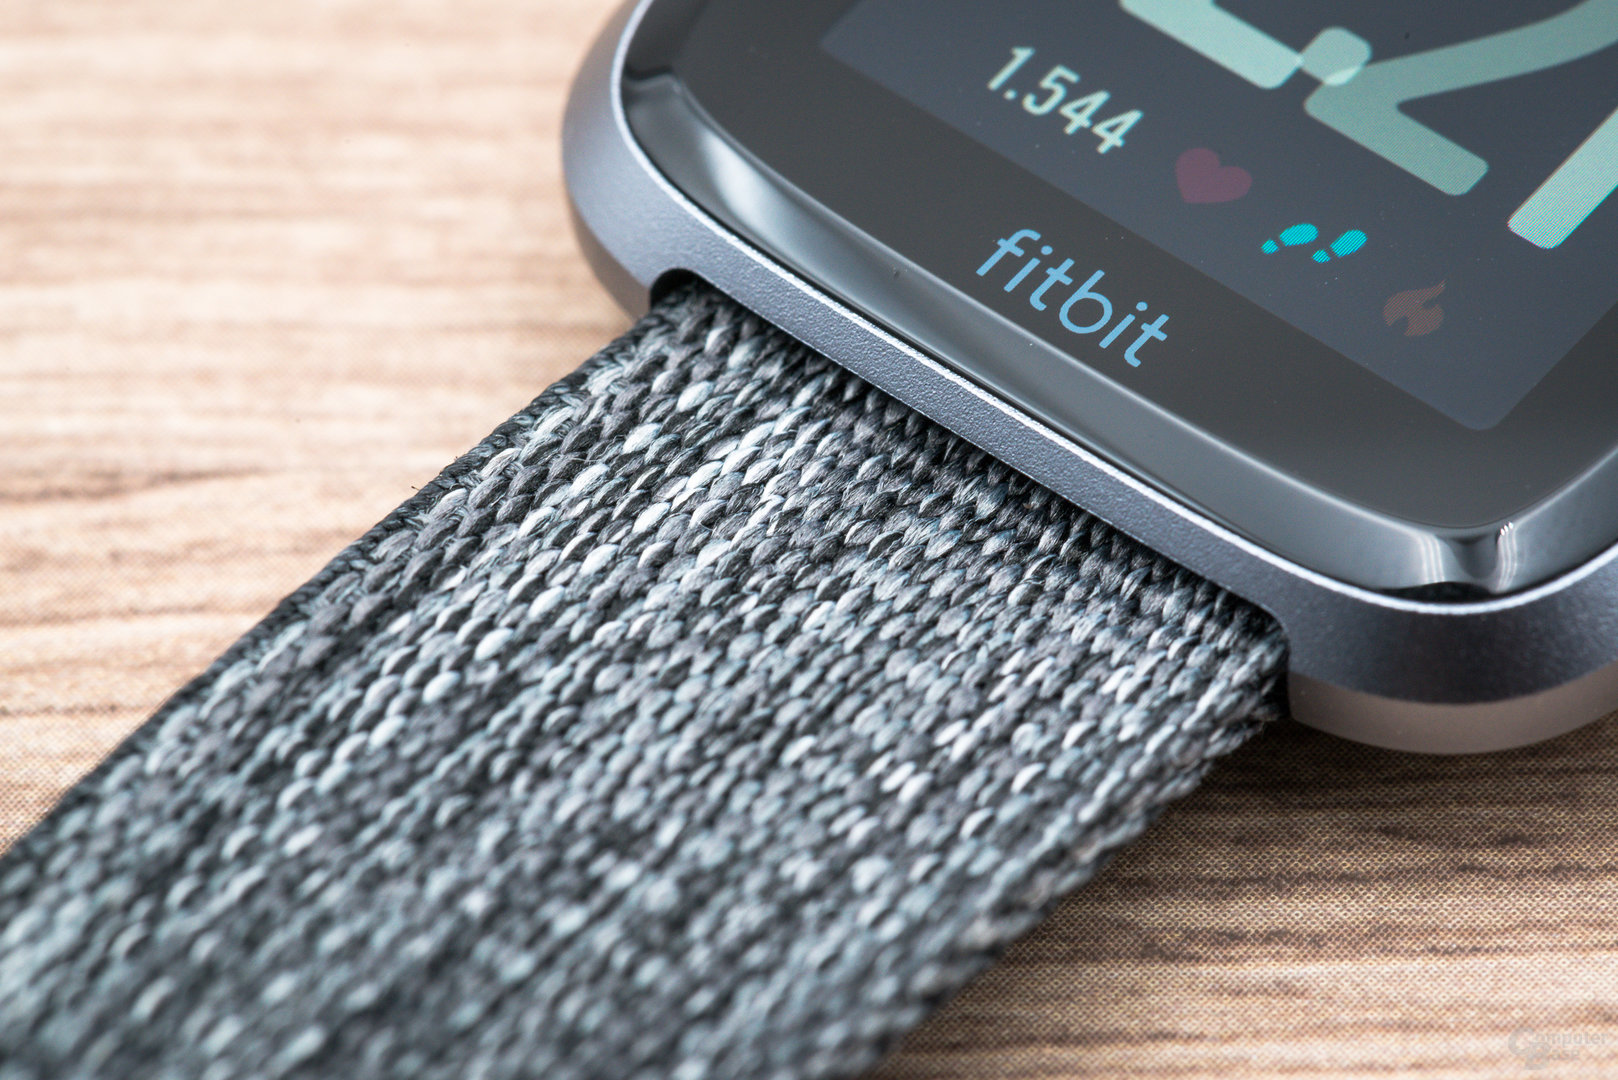 Fitbit Versa im Test: Armband im Detail